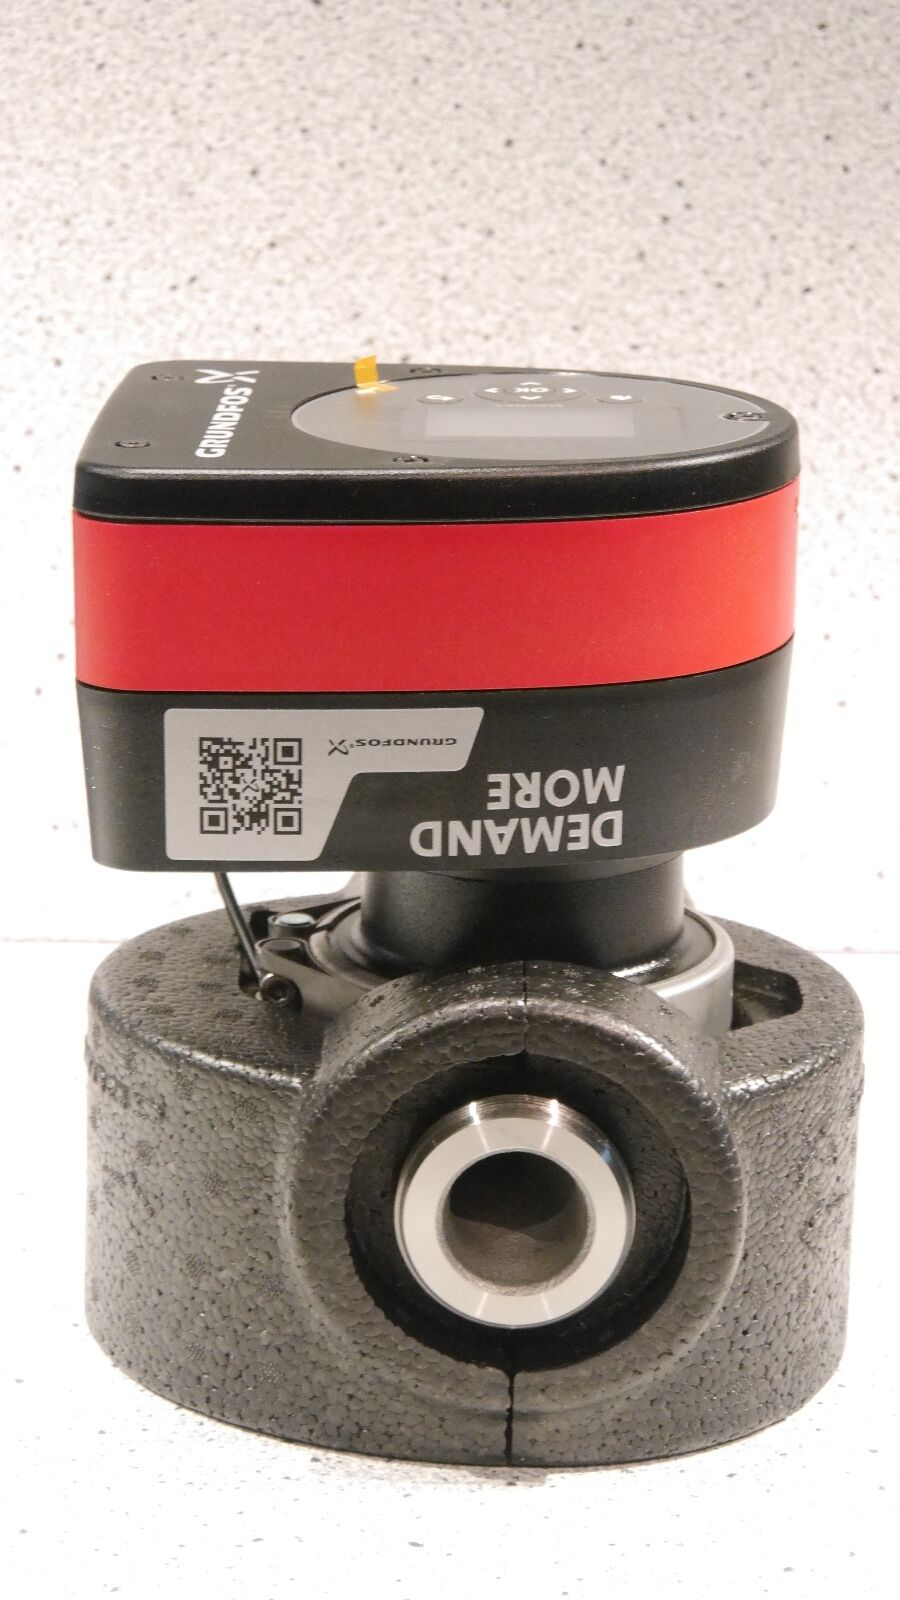 Neue Grundfos Pumpe Magna3 32-100 N 180 Edelstahl 97924724 PN 10 OVP NEU